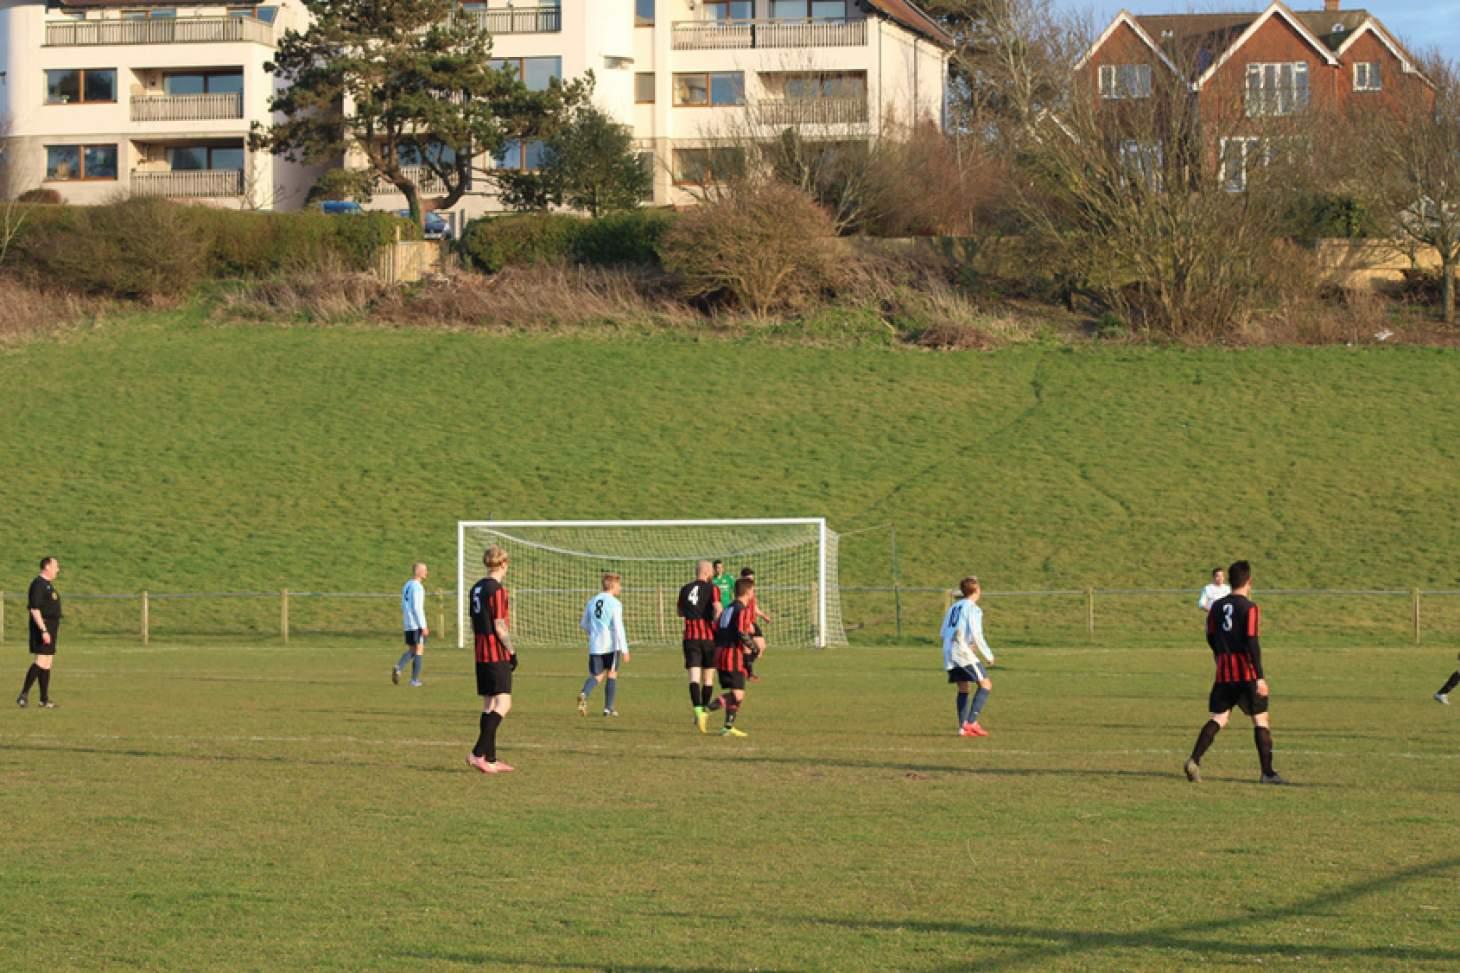 Rottingdean Football 11 a side | Grass football pitch